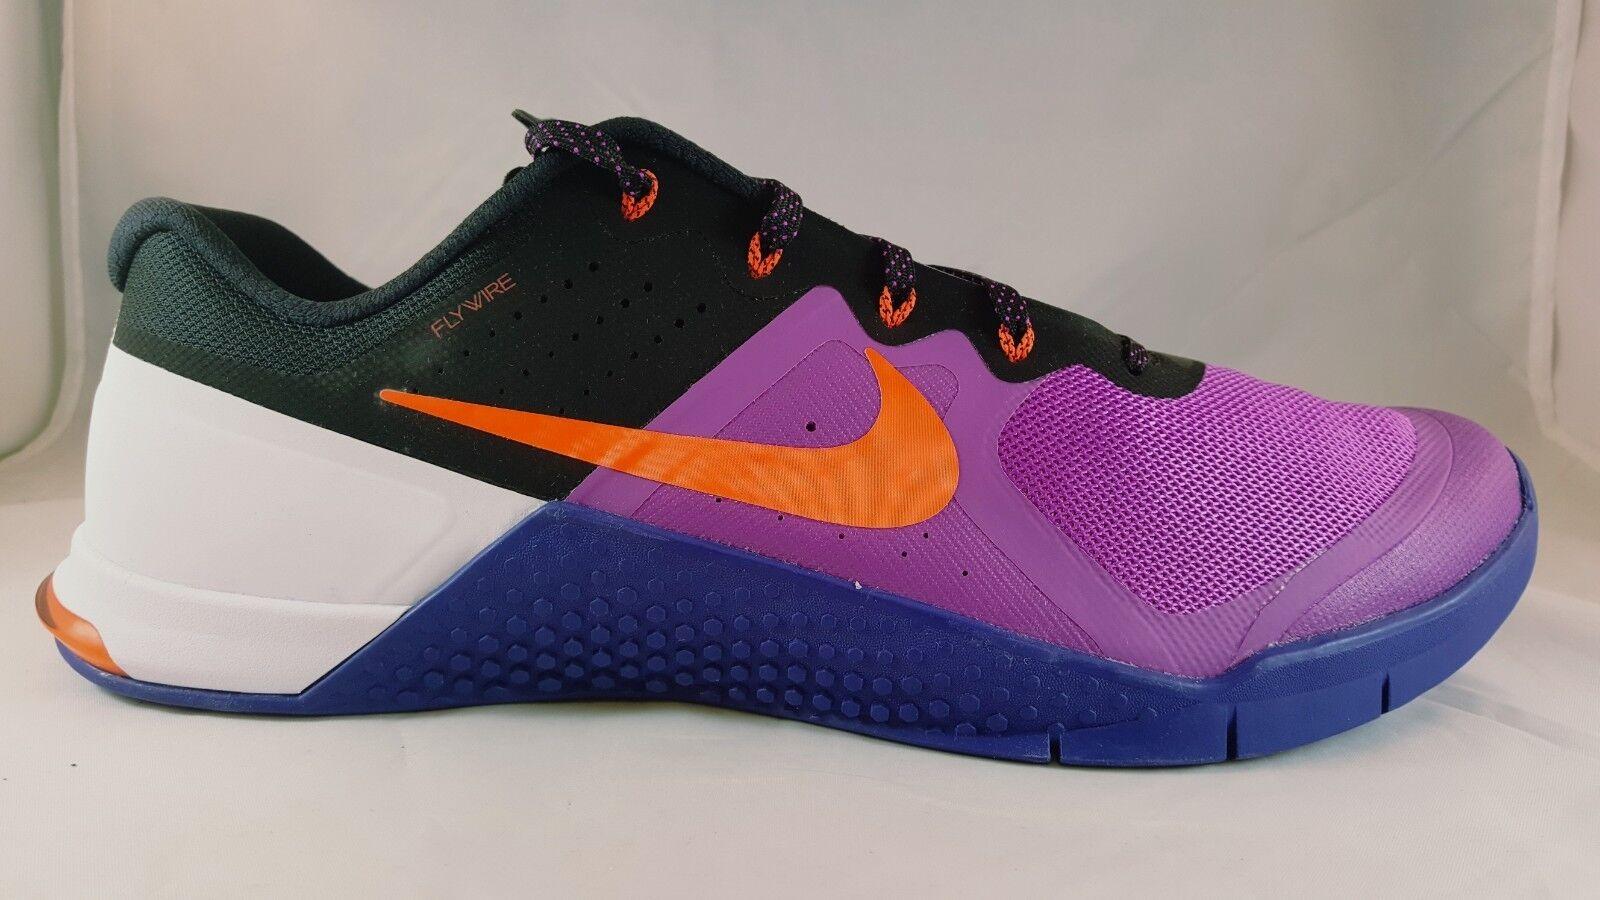 Nike Metcon 2 Men's Cross Training Shoe 819899 560 Comfortable Casual wild Casual wild